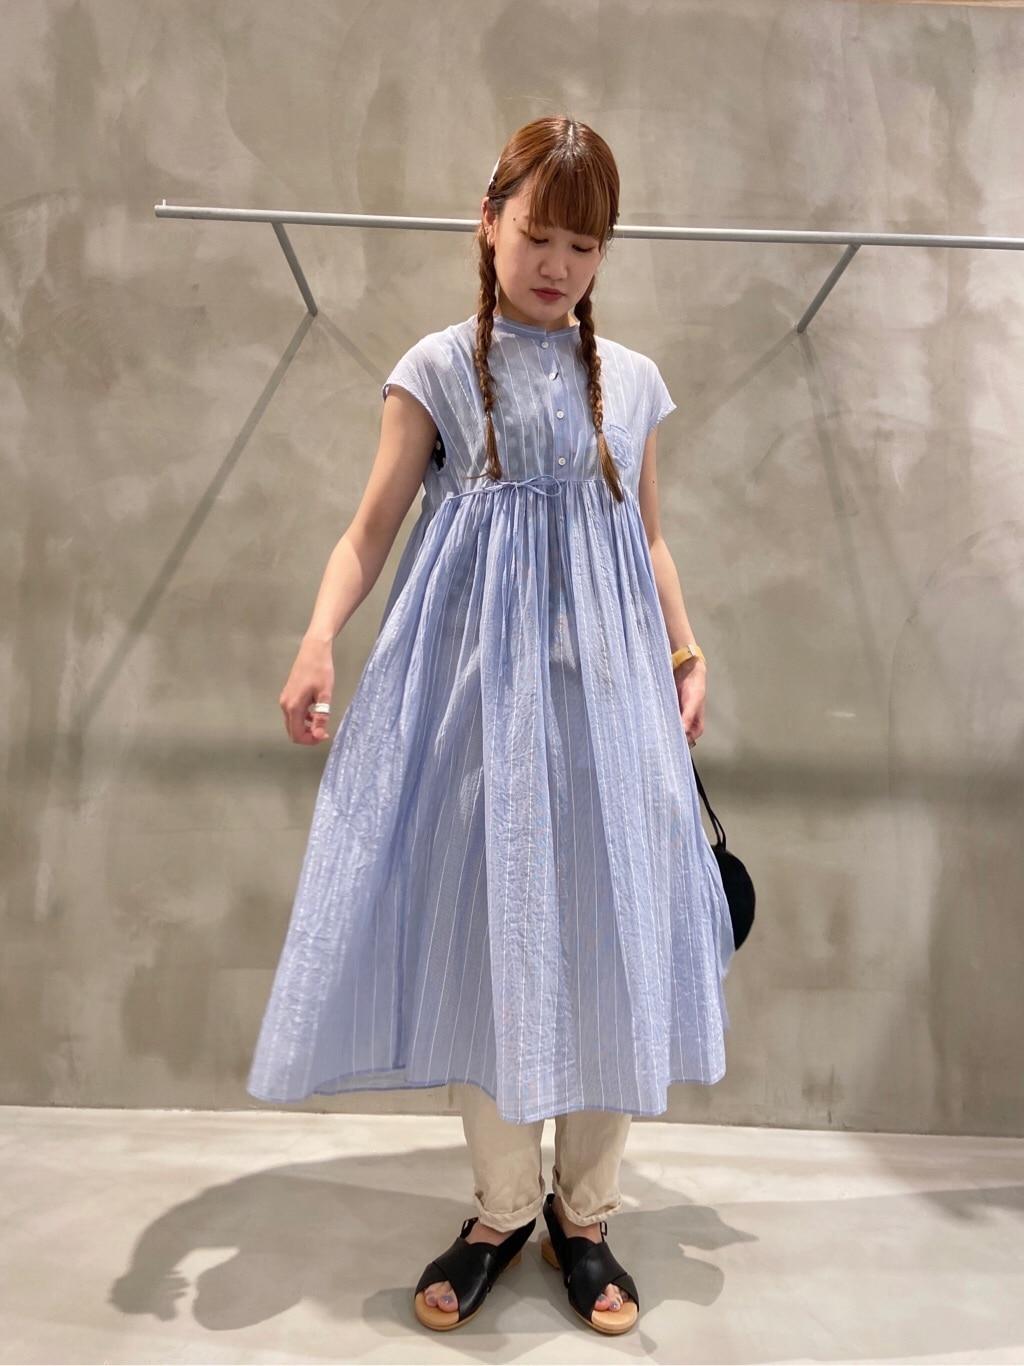 bulle de savon 渋谷スクランブルスクエア 身長:160cm 2020.06.23